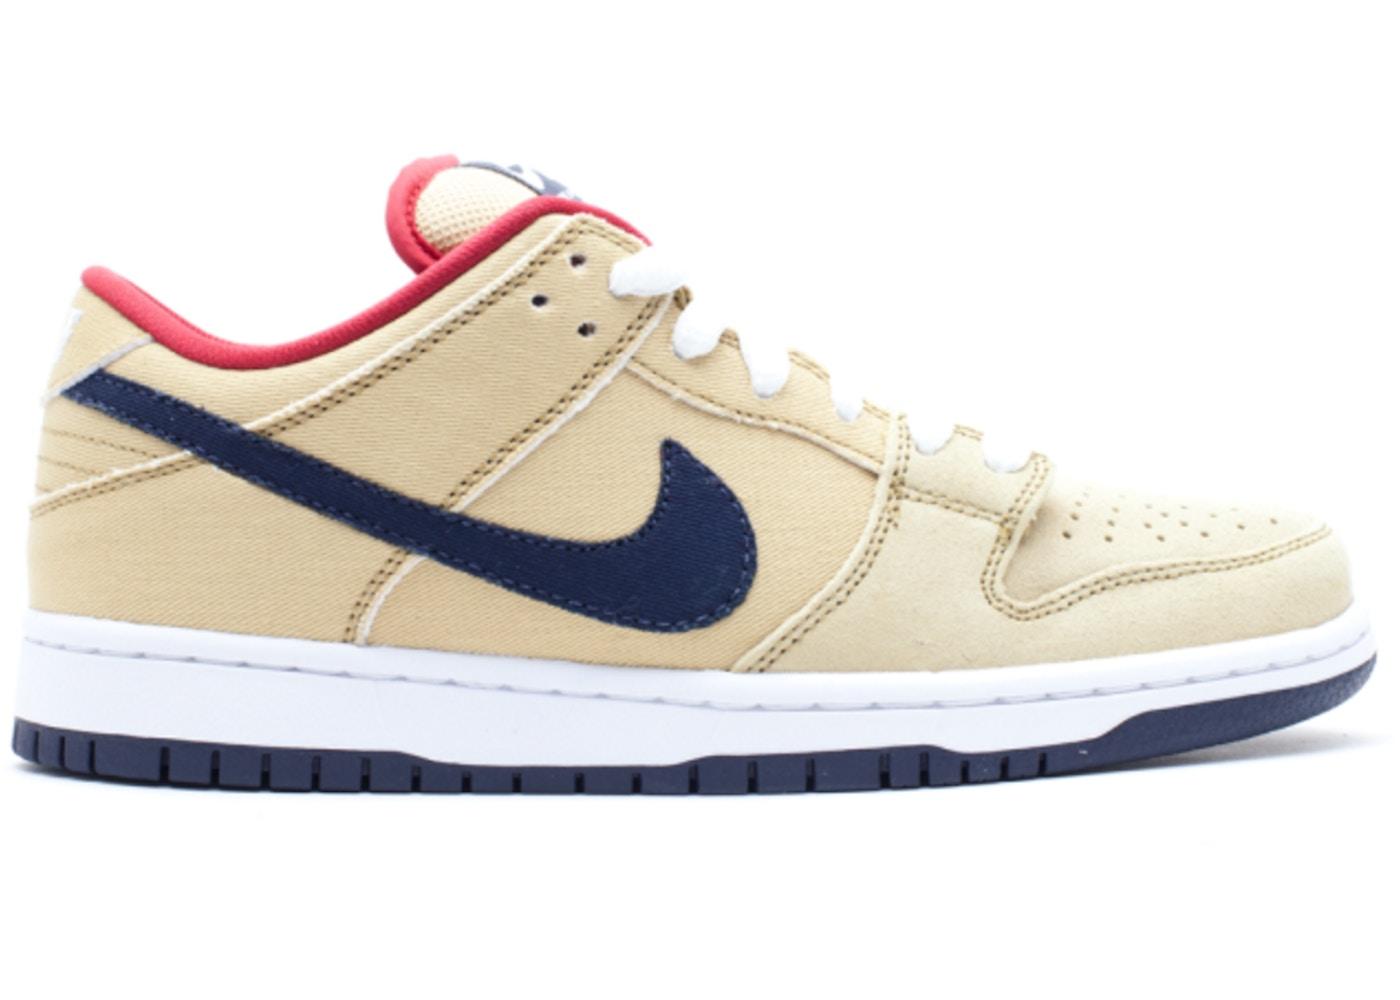 new style e4c0d c84b9 Nike Dunk SB Low Gold Dust - 304292-705